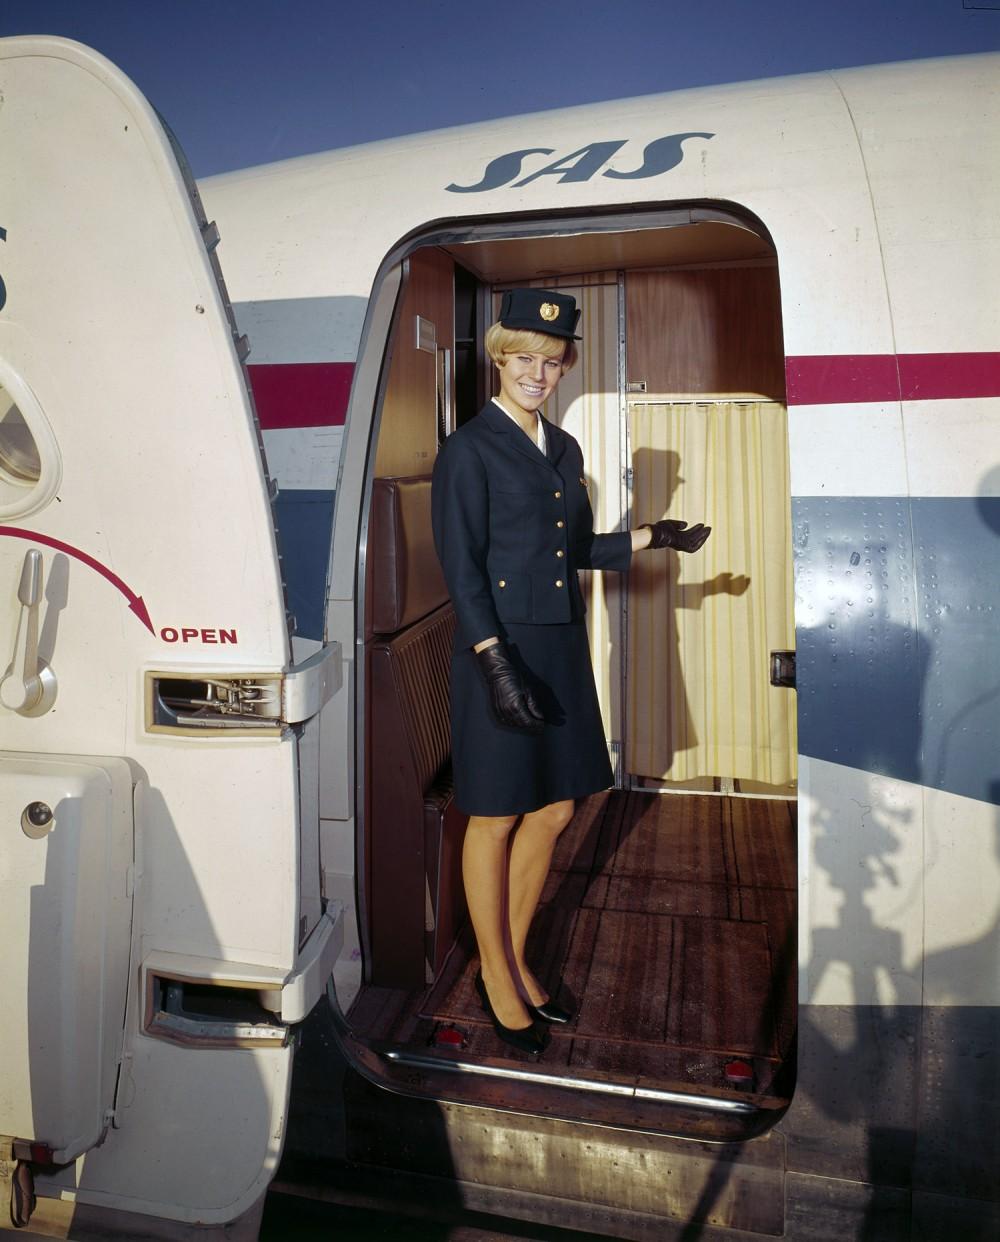 Flight attendant gets jet logs hardcore sex in plane to a hot horny passenger Part 5